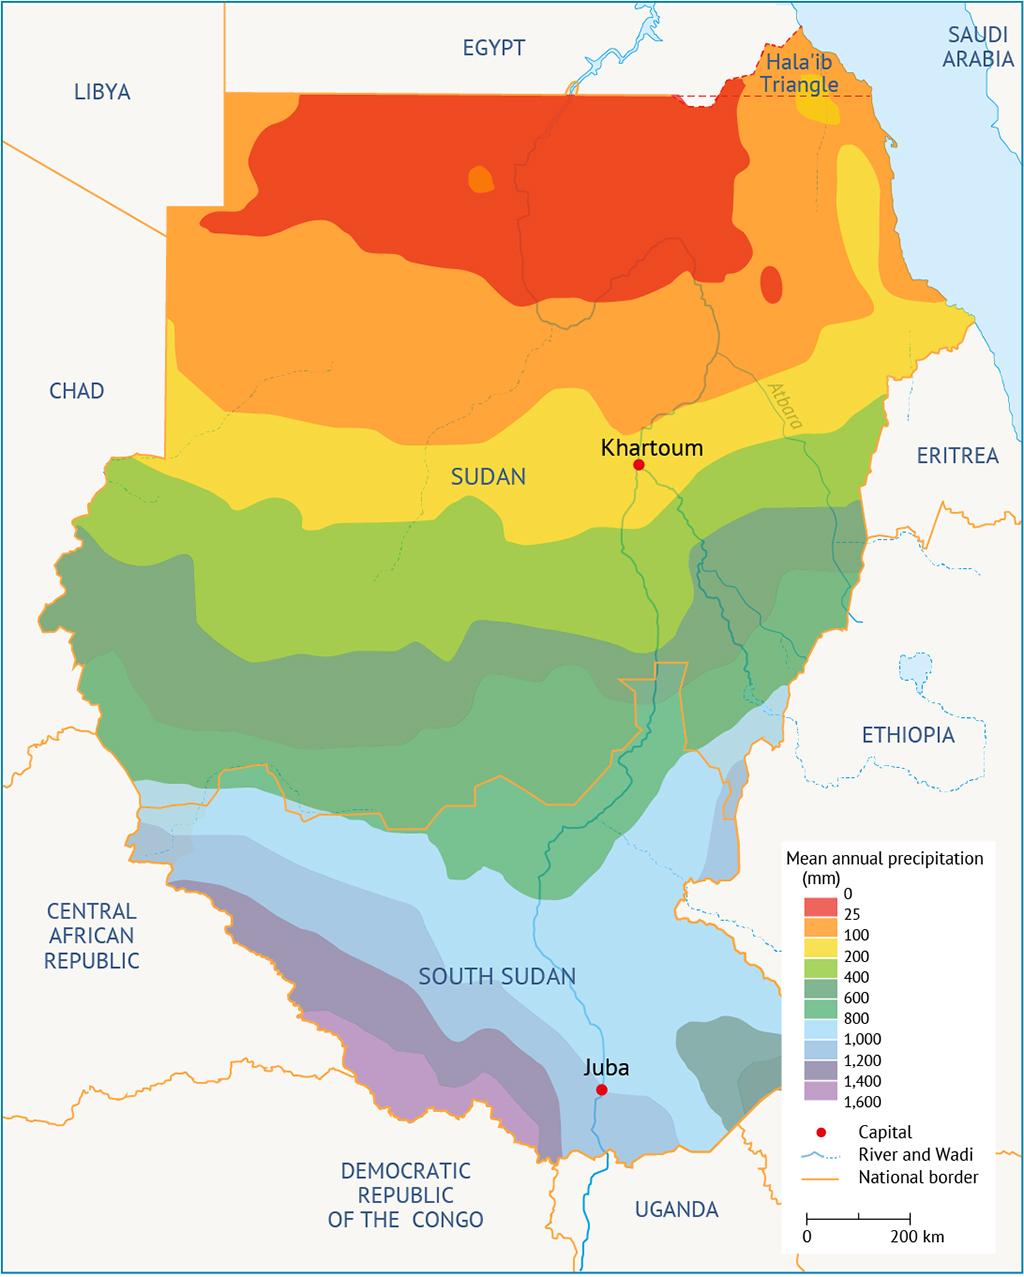 Average annual rainfall in South Sudan and Sudan